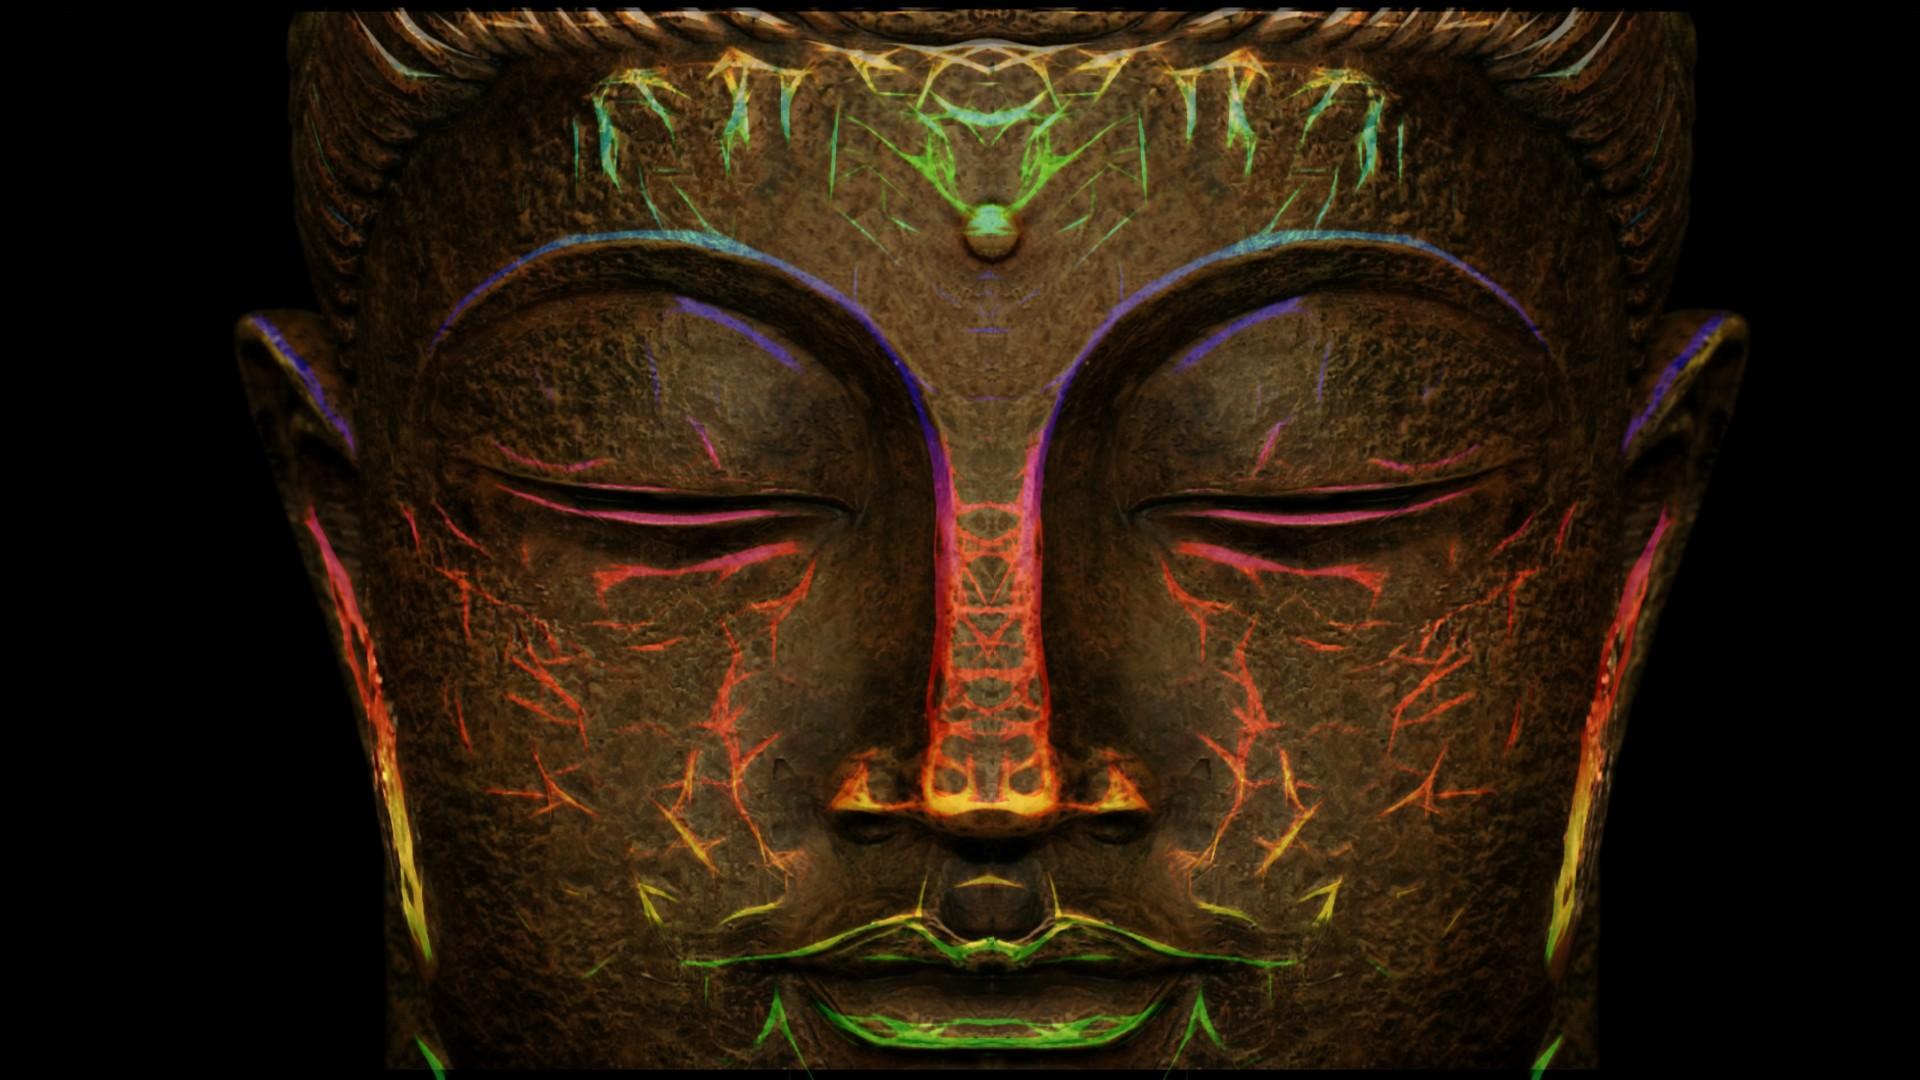 Lord buddha original images